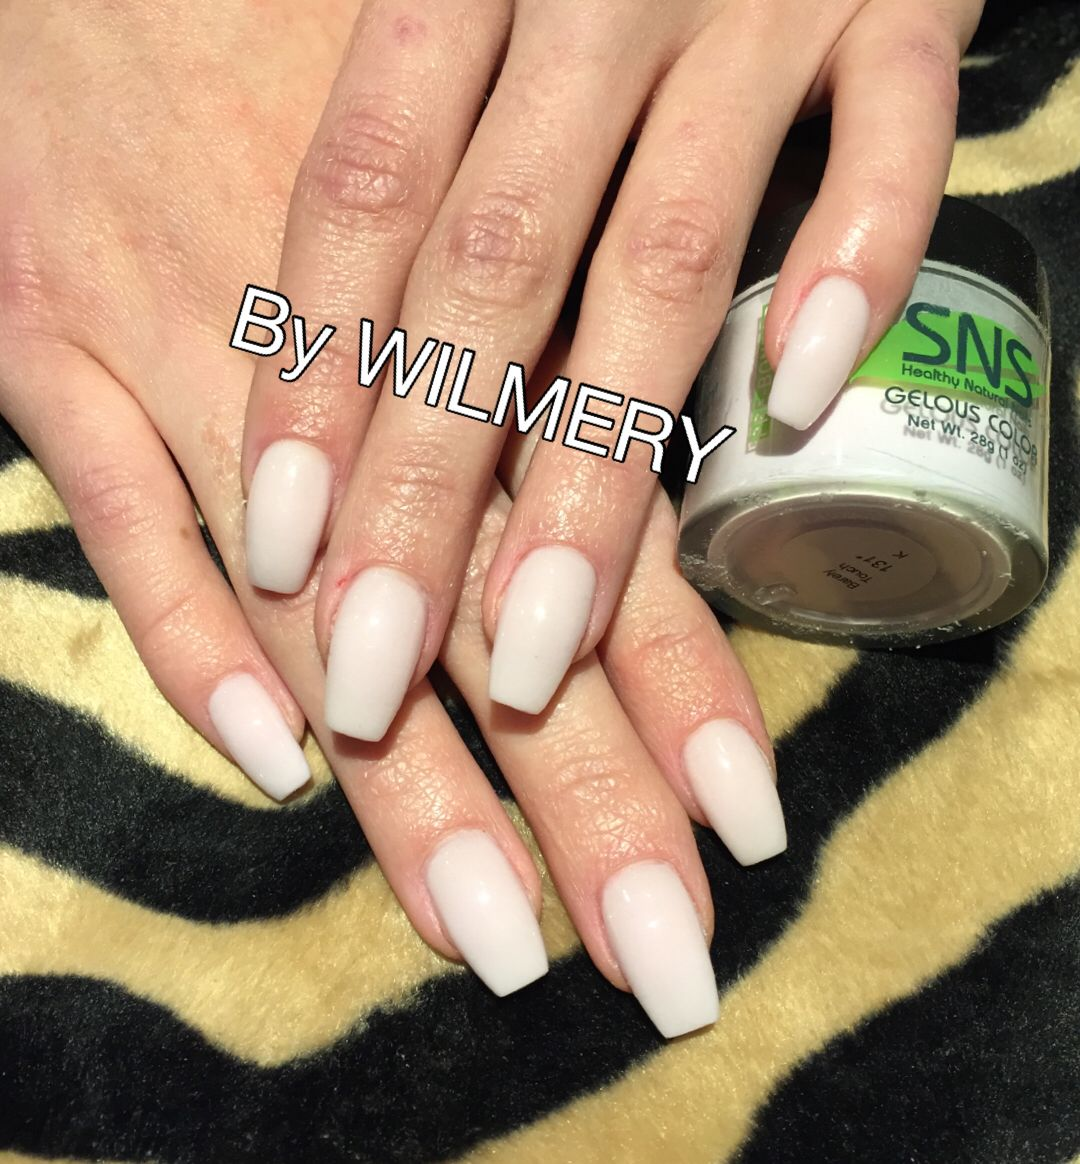 Pin by tamika parker on nails | Pinterest | Sns nails, Angel nails ...